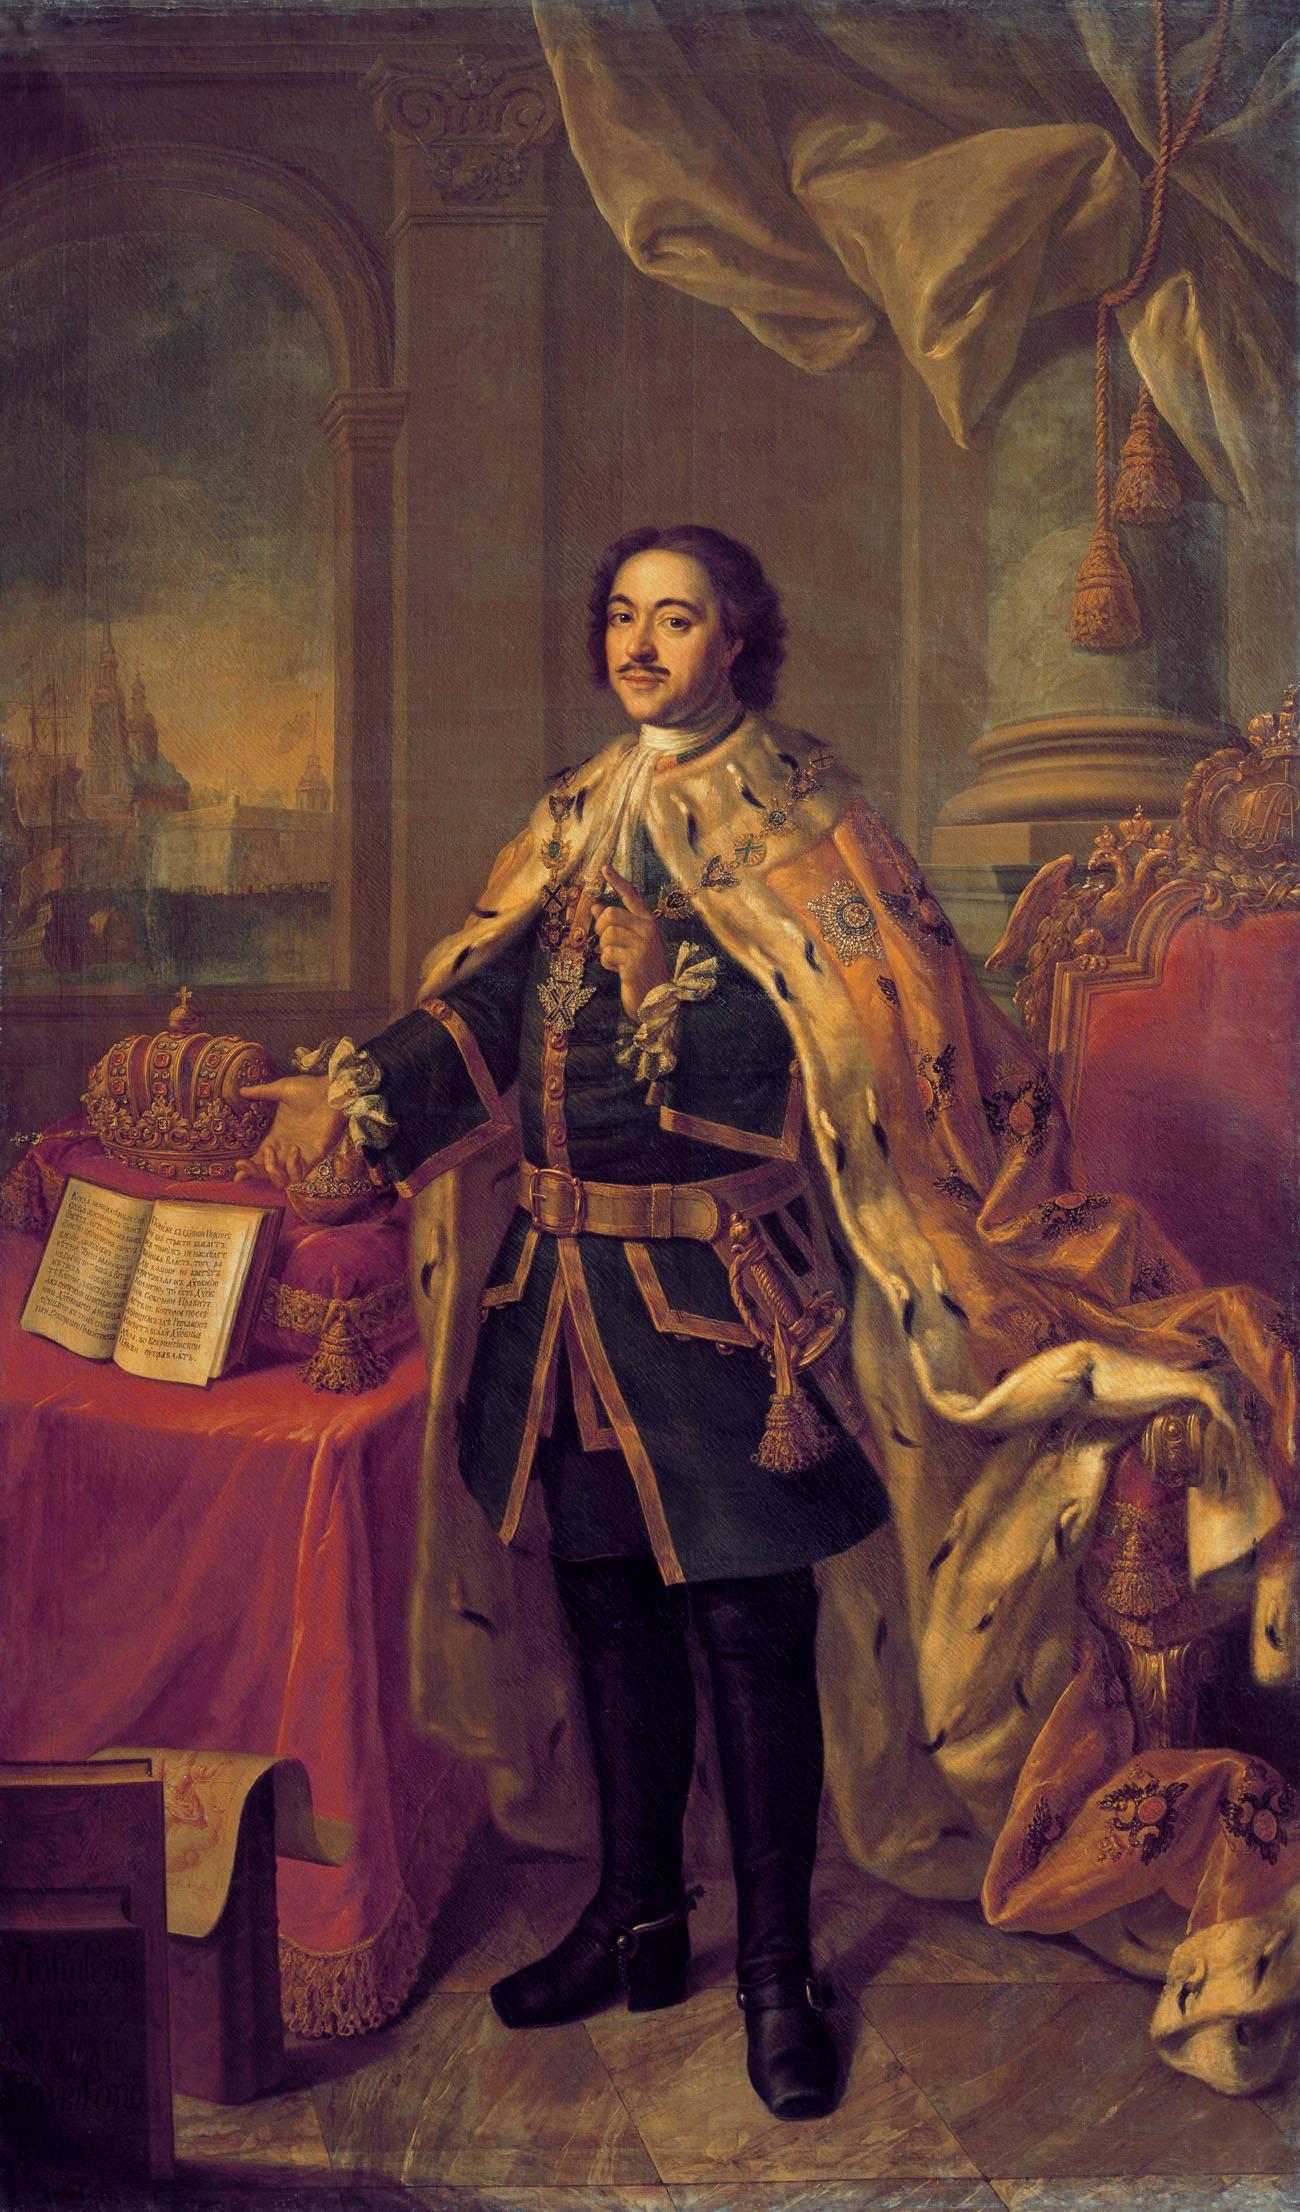 Петър Велики. Худ. Алексей Антропов (1716-1795)